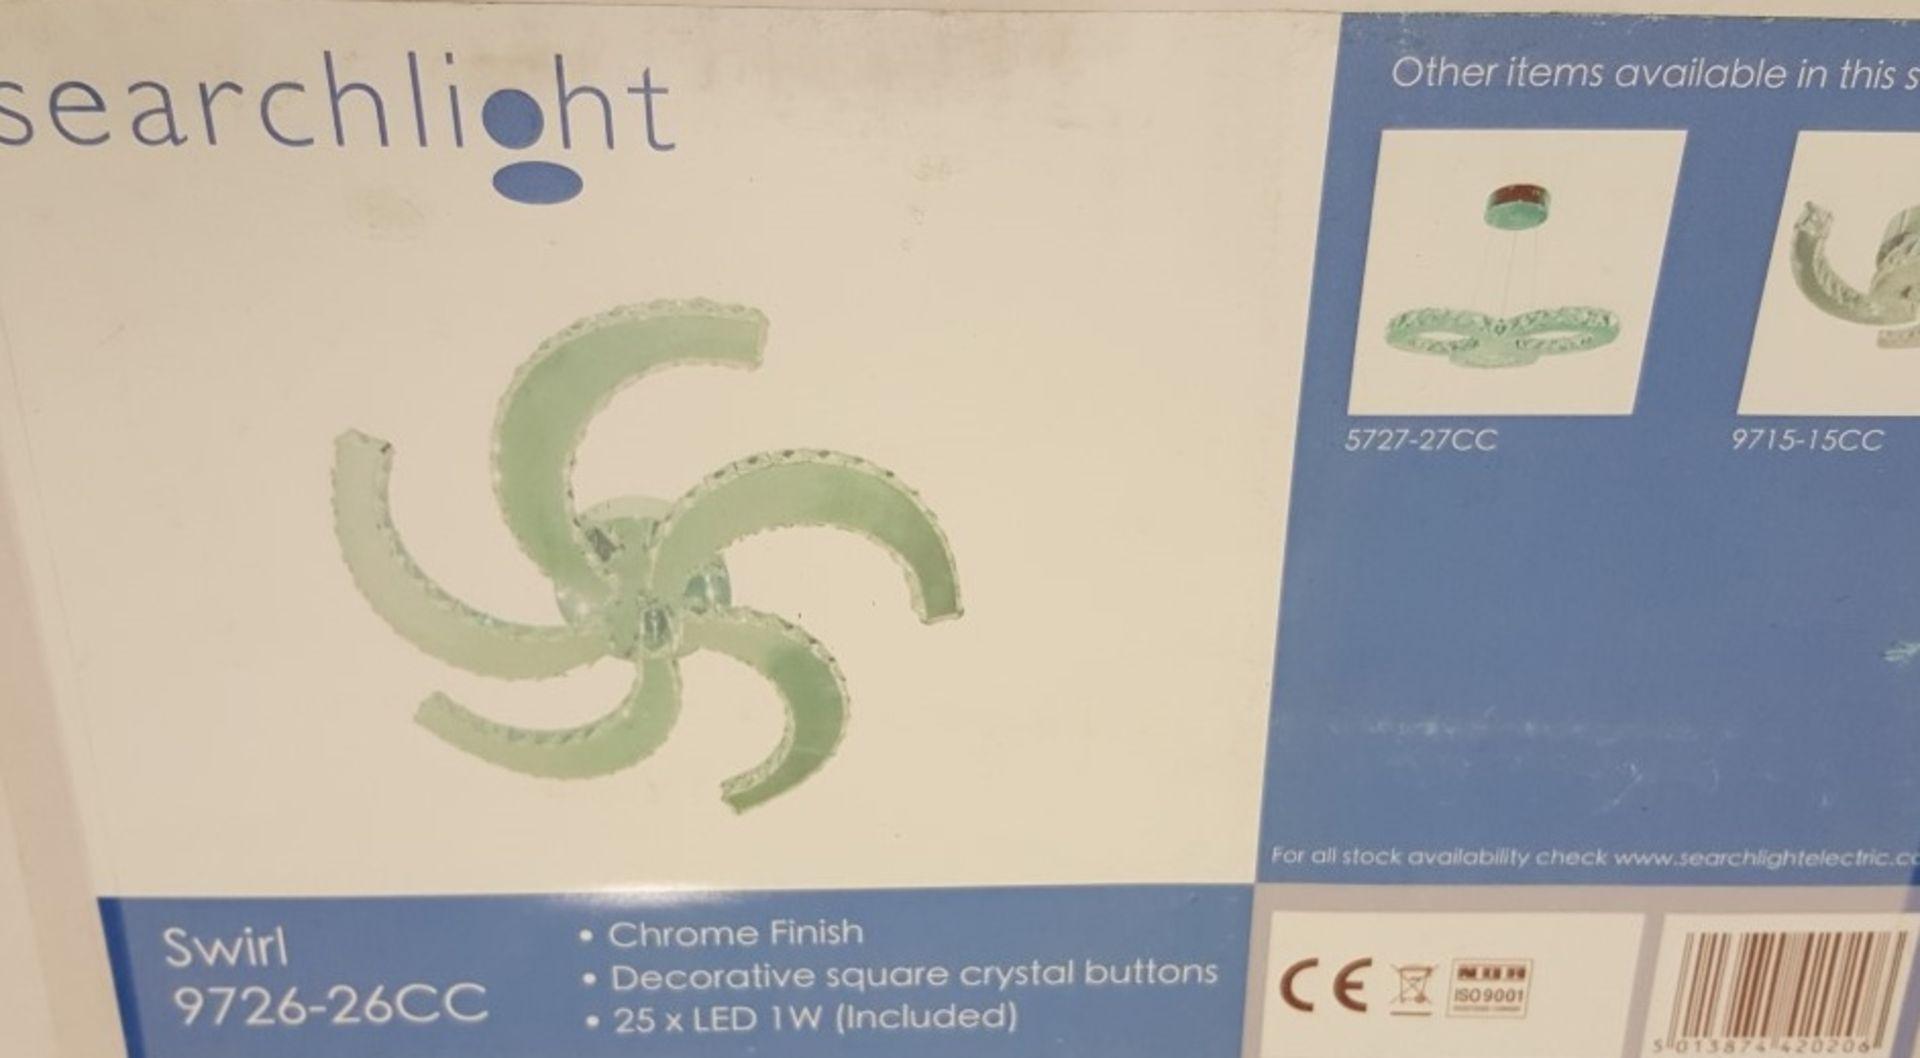 Lot 9036 - 1 x Searchlight 9726-26CC Clover 26 Light Flush Crystal Ceiling Light Polished Chrome - New Boxed